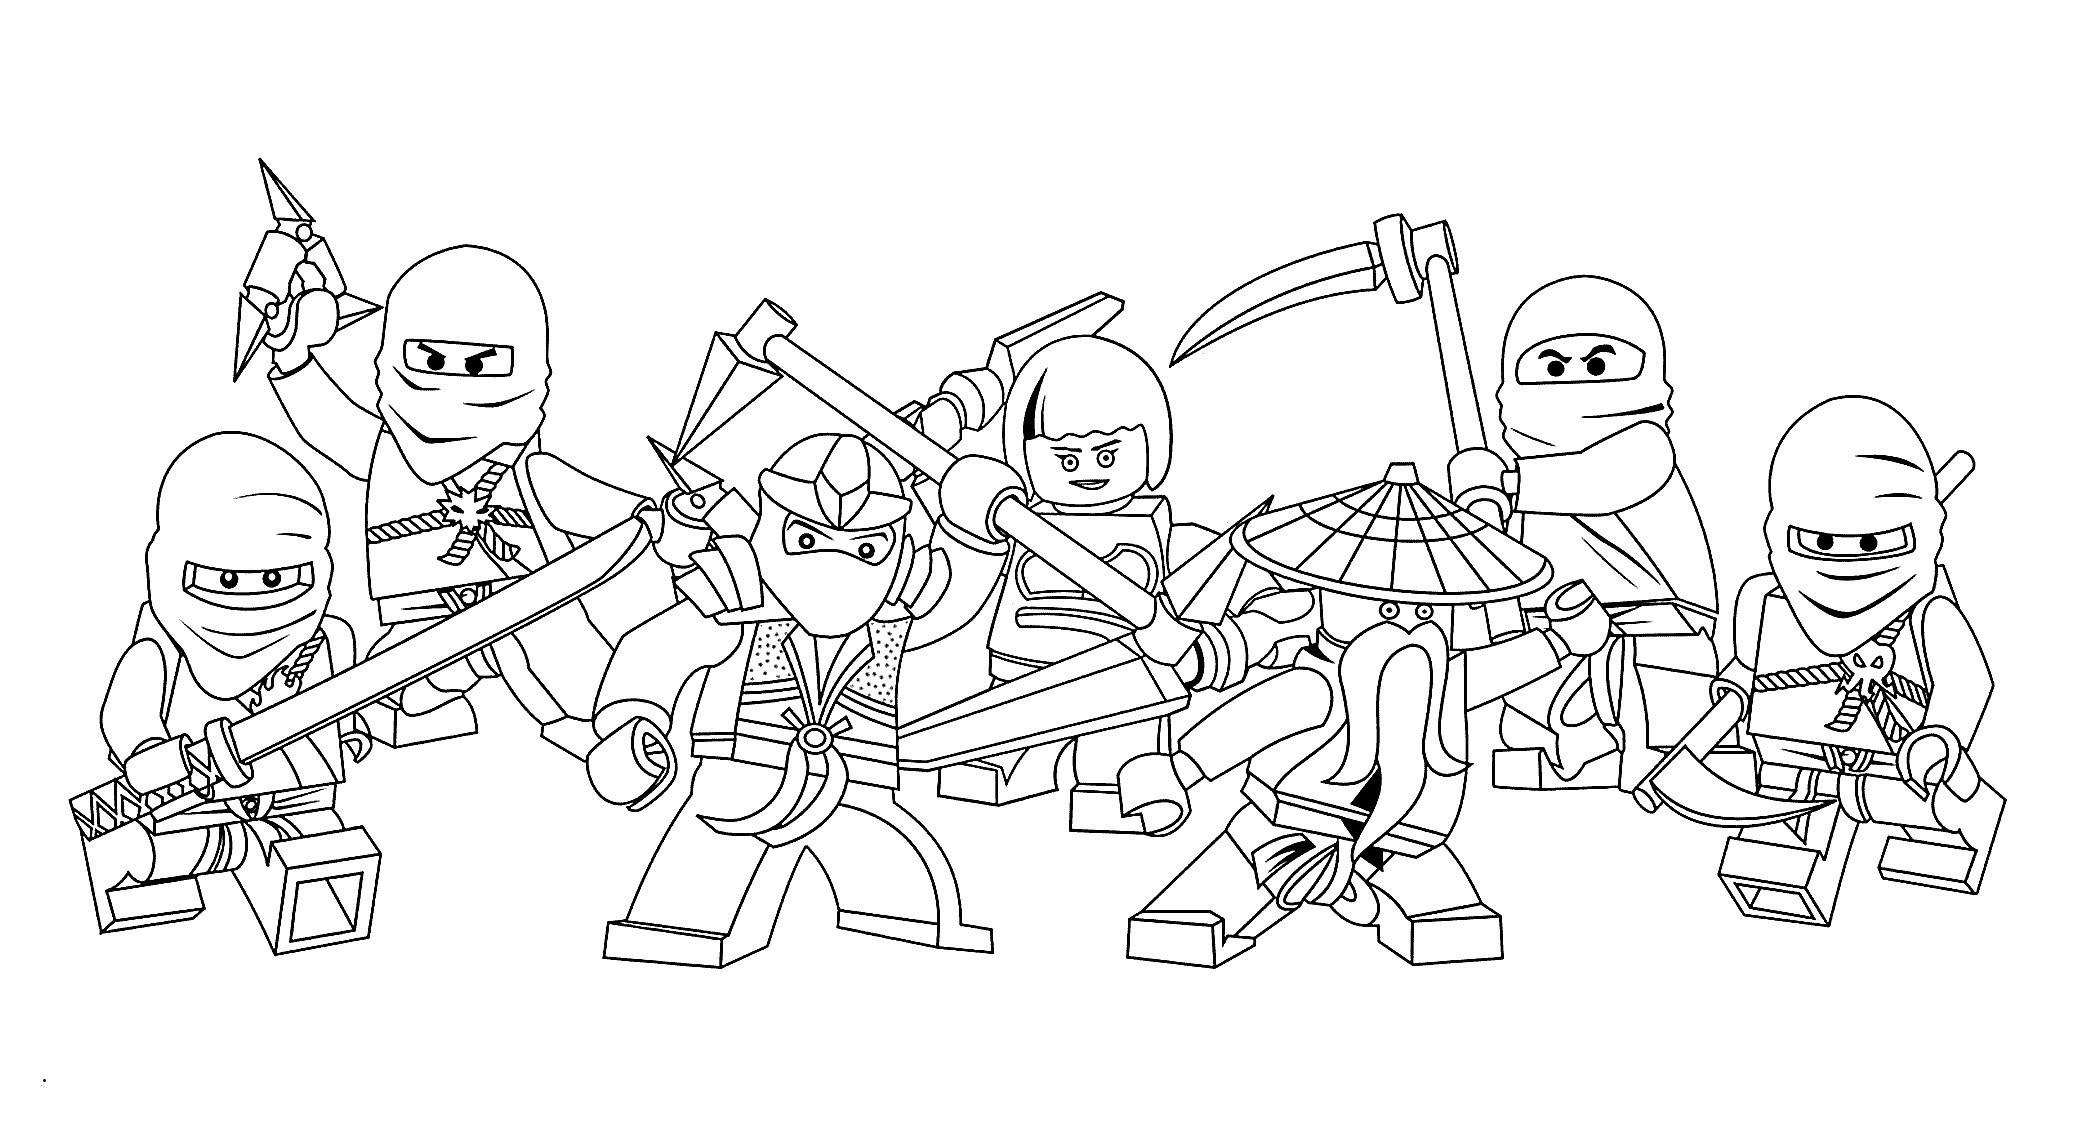 Ninjago Lloyd Ausmalbilder Frisch Ninjago Ausmalbilder Lloyd 2015 Inspirierend Free Printable Lego Bild